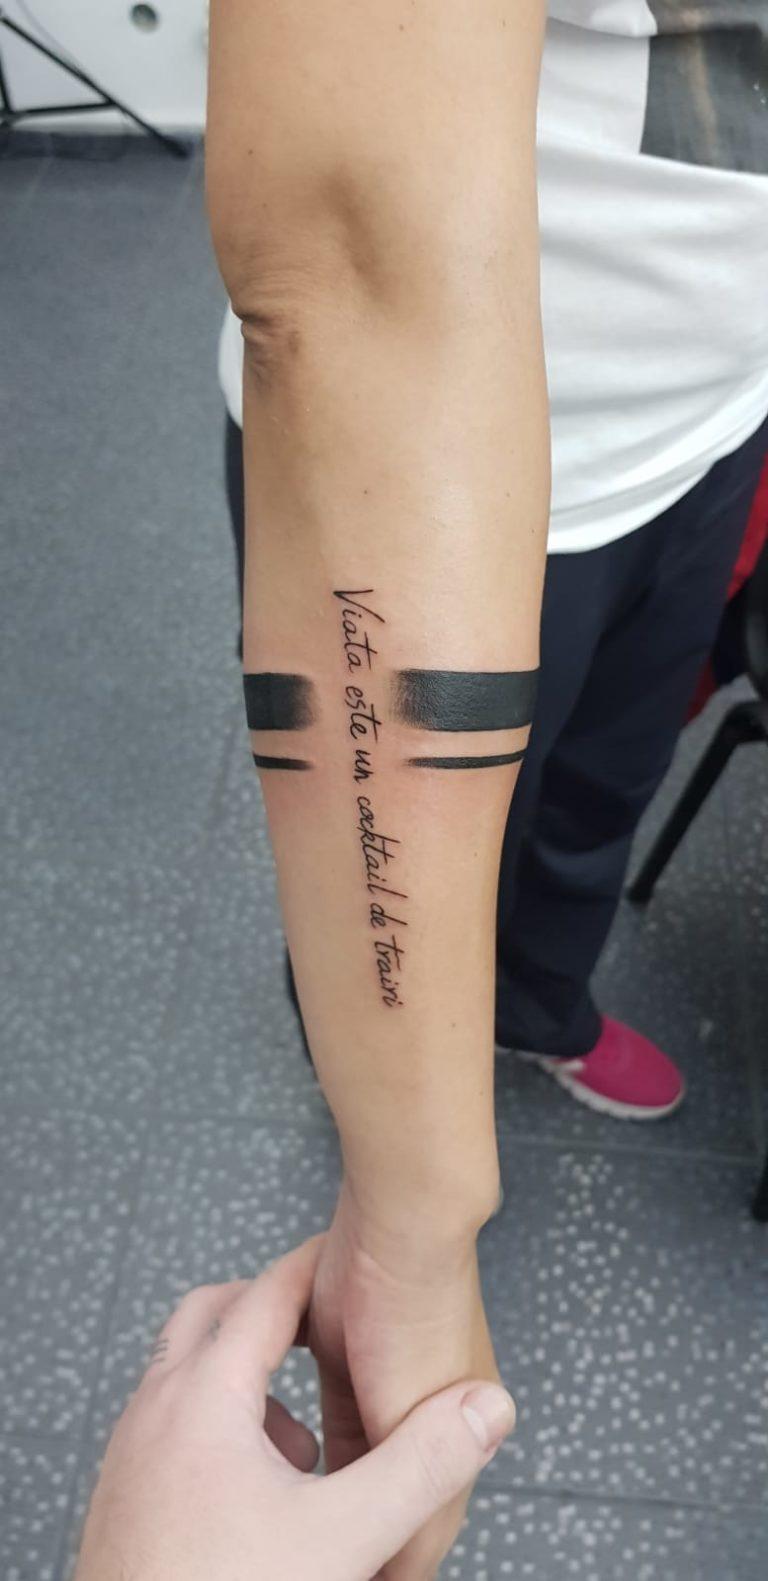 salon tatuaje funky tattoo bucuresti  tatuaj scris tatuaj antebrat barbati tatuaj bratara